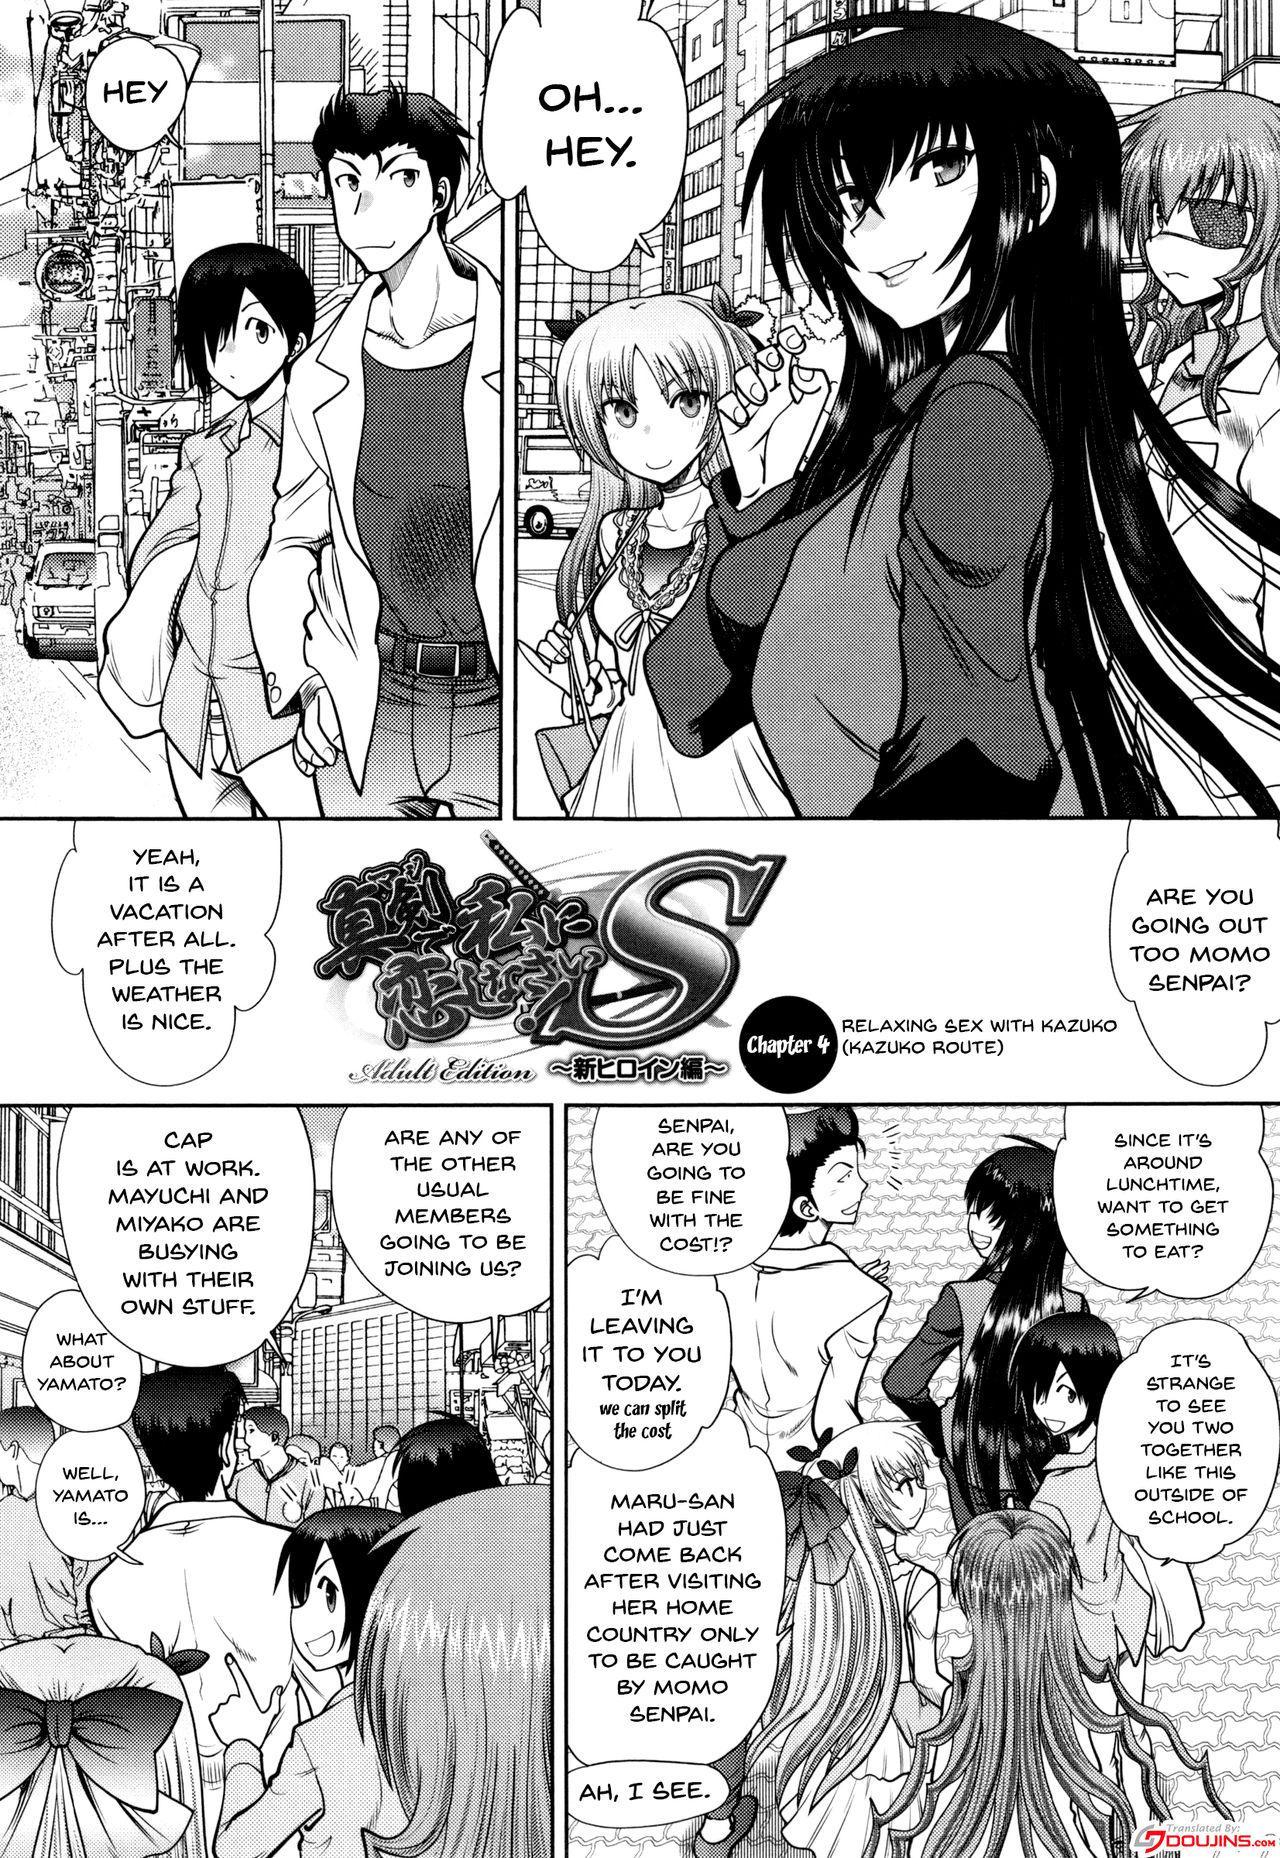 [Yagami Dai] Maji de Watashi ni Koi Shinasai! S Adult Edition ~Shodai Heroine Hen~ | Fall in Love With Me For Real! Ch.1-8 [English] {Doujins.com} 65